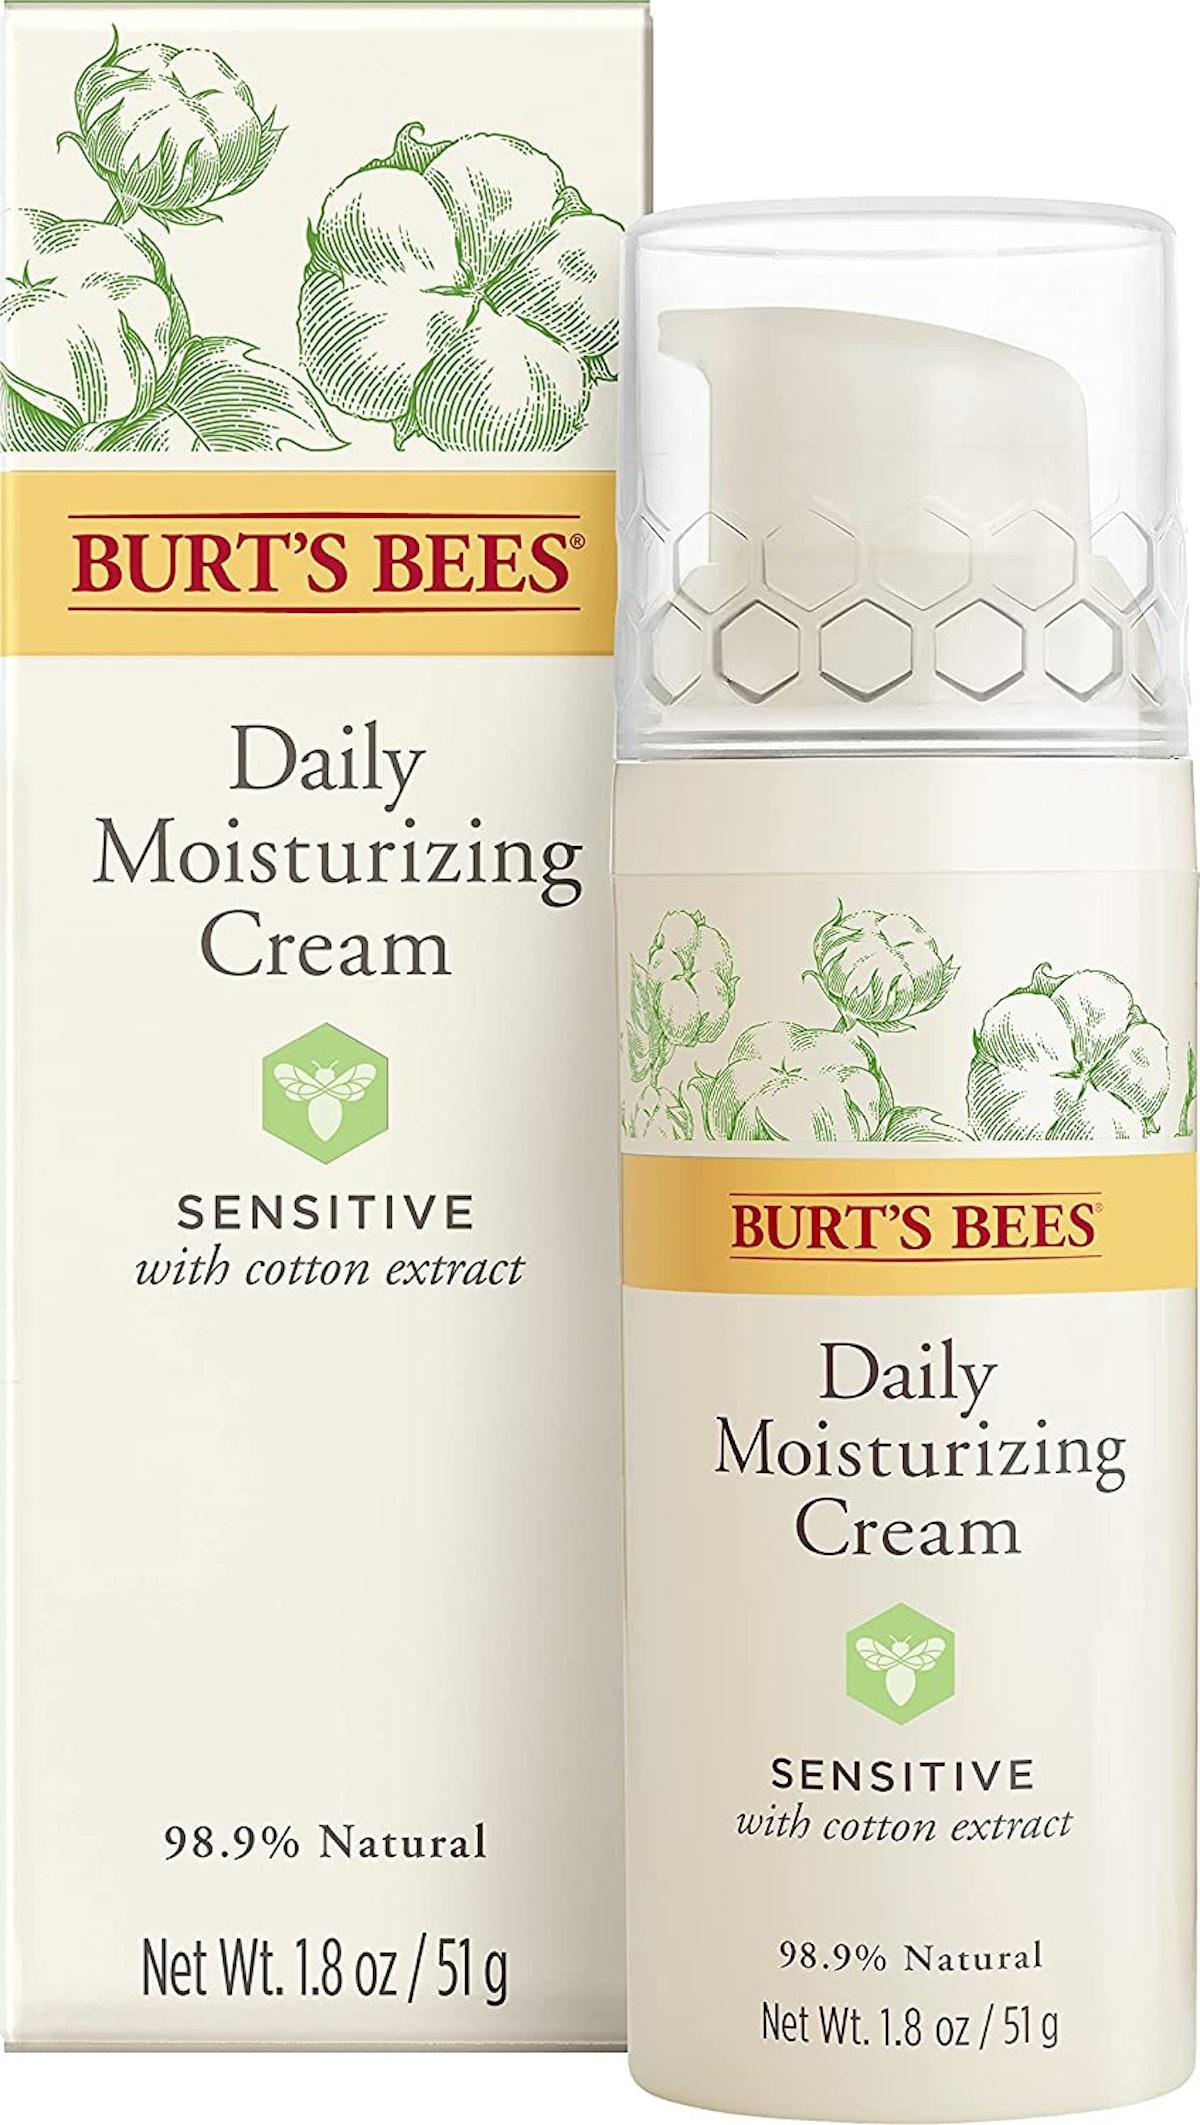 Burt's Bees Daily Face Moisturizing Cream